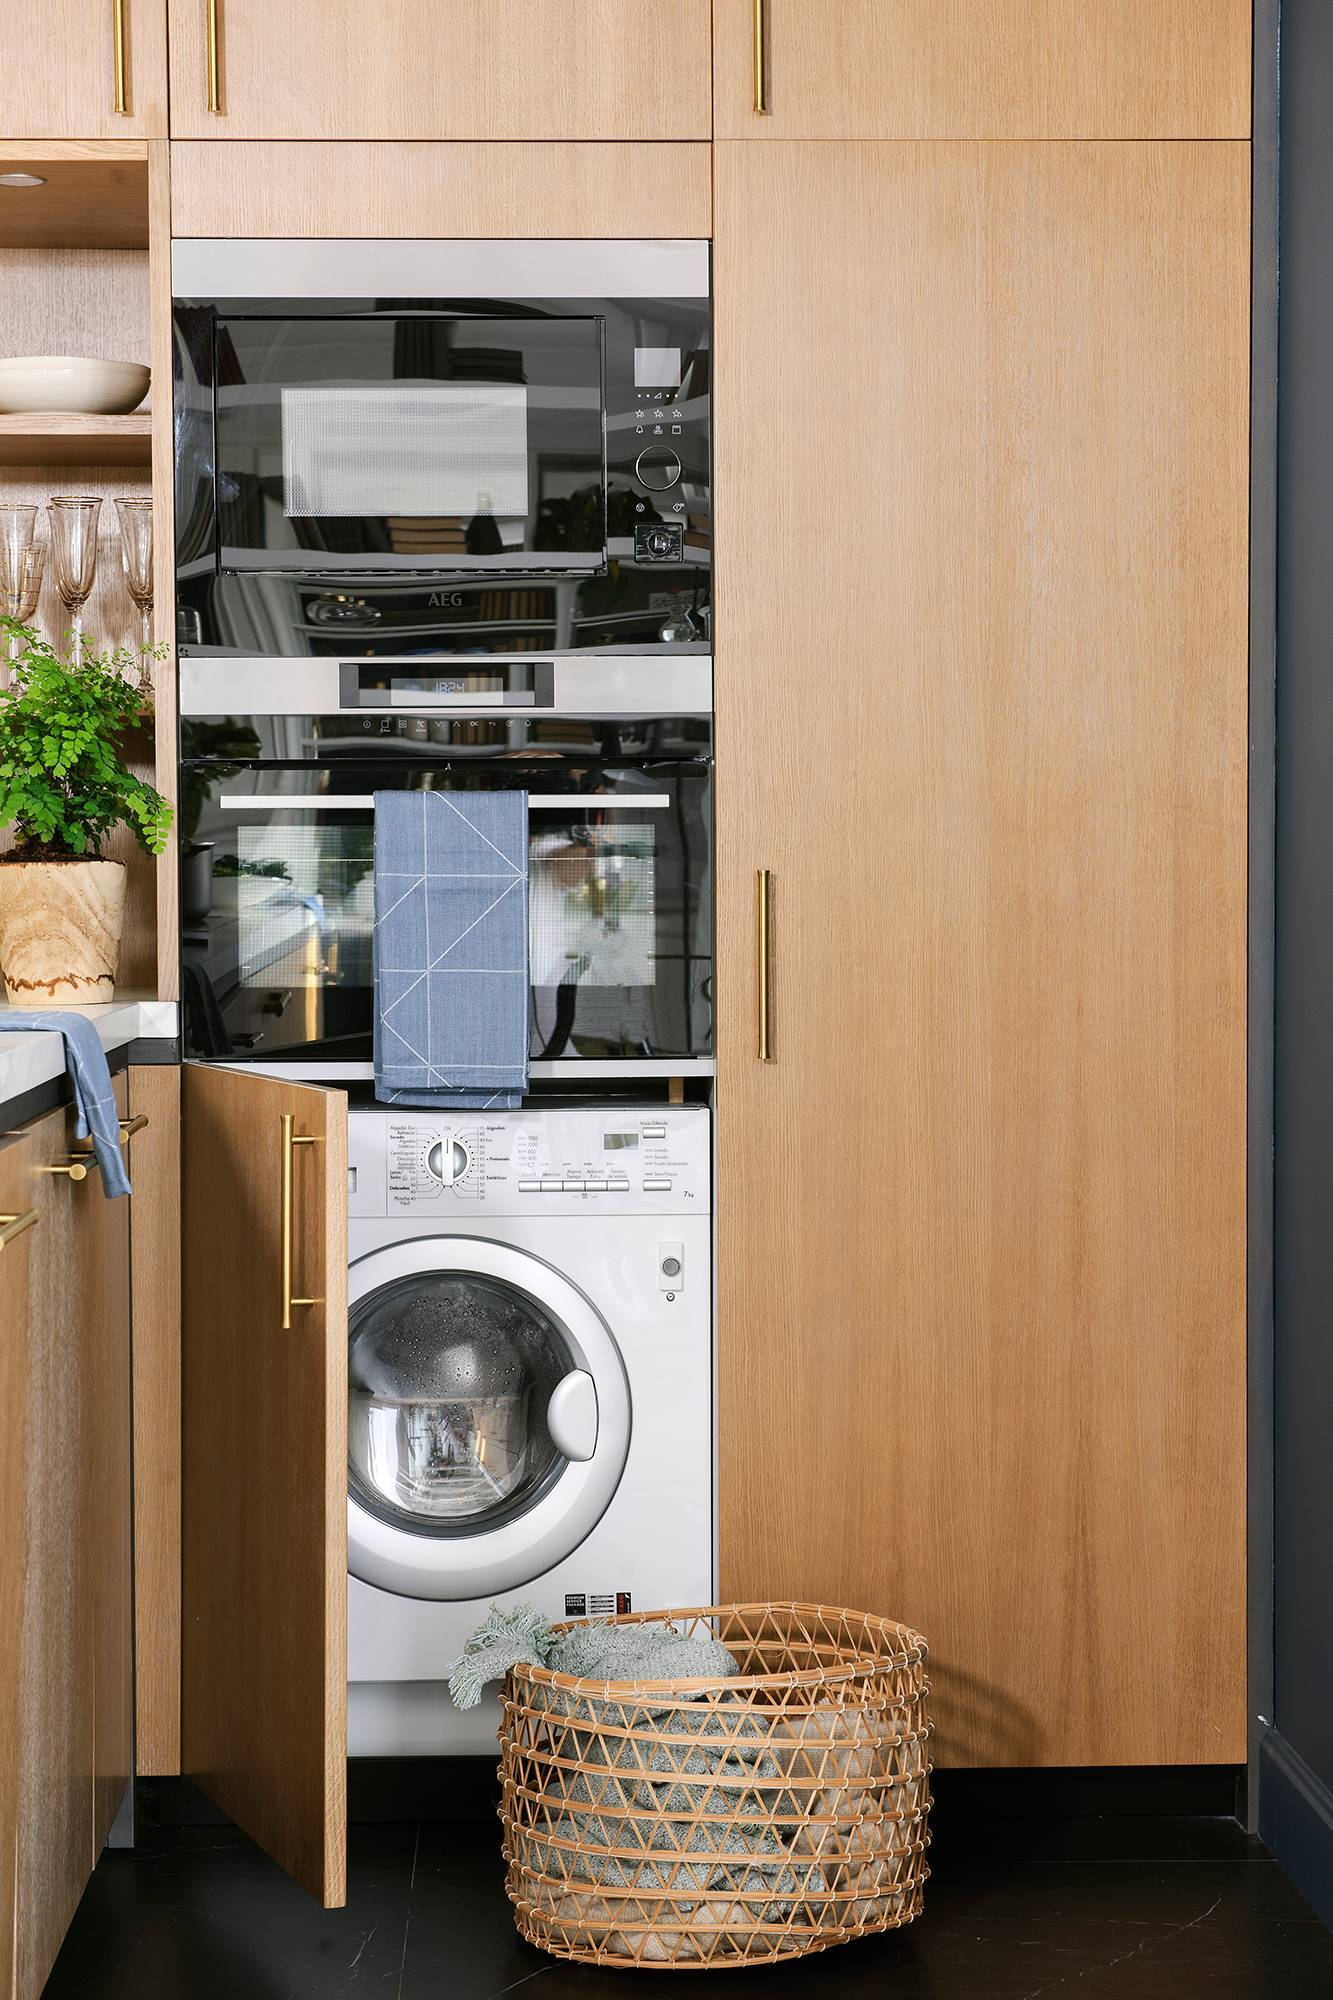 50 washing machine cleaning tricks 00470703. 20. Good maintenance, a perfect washing machine